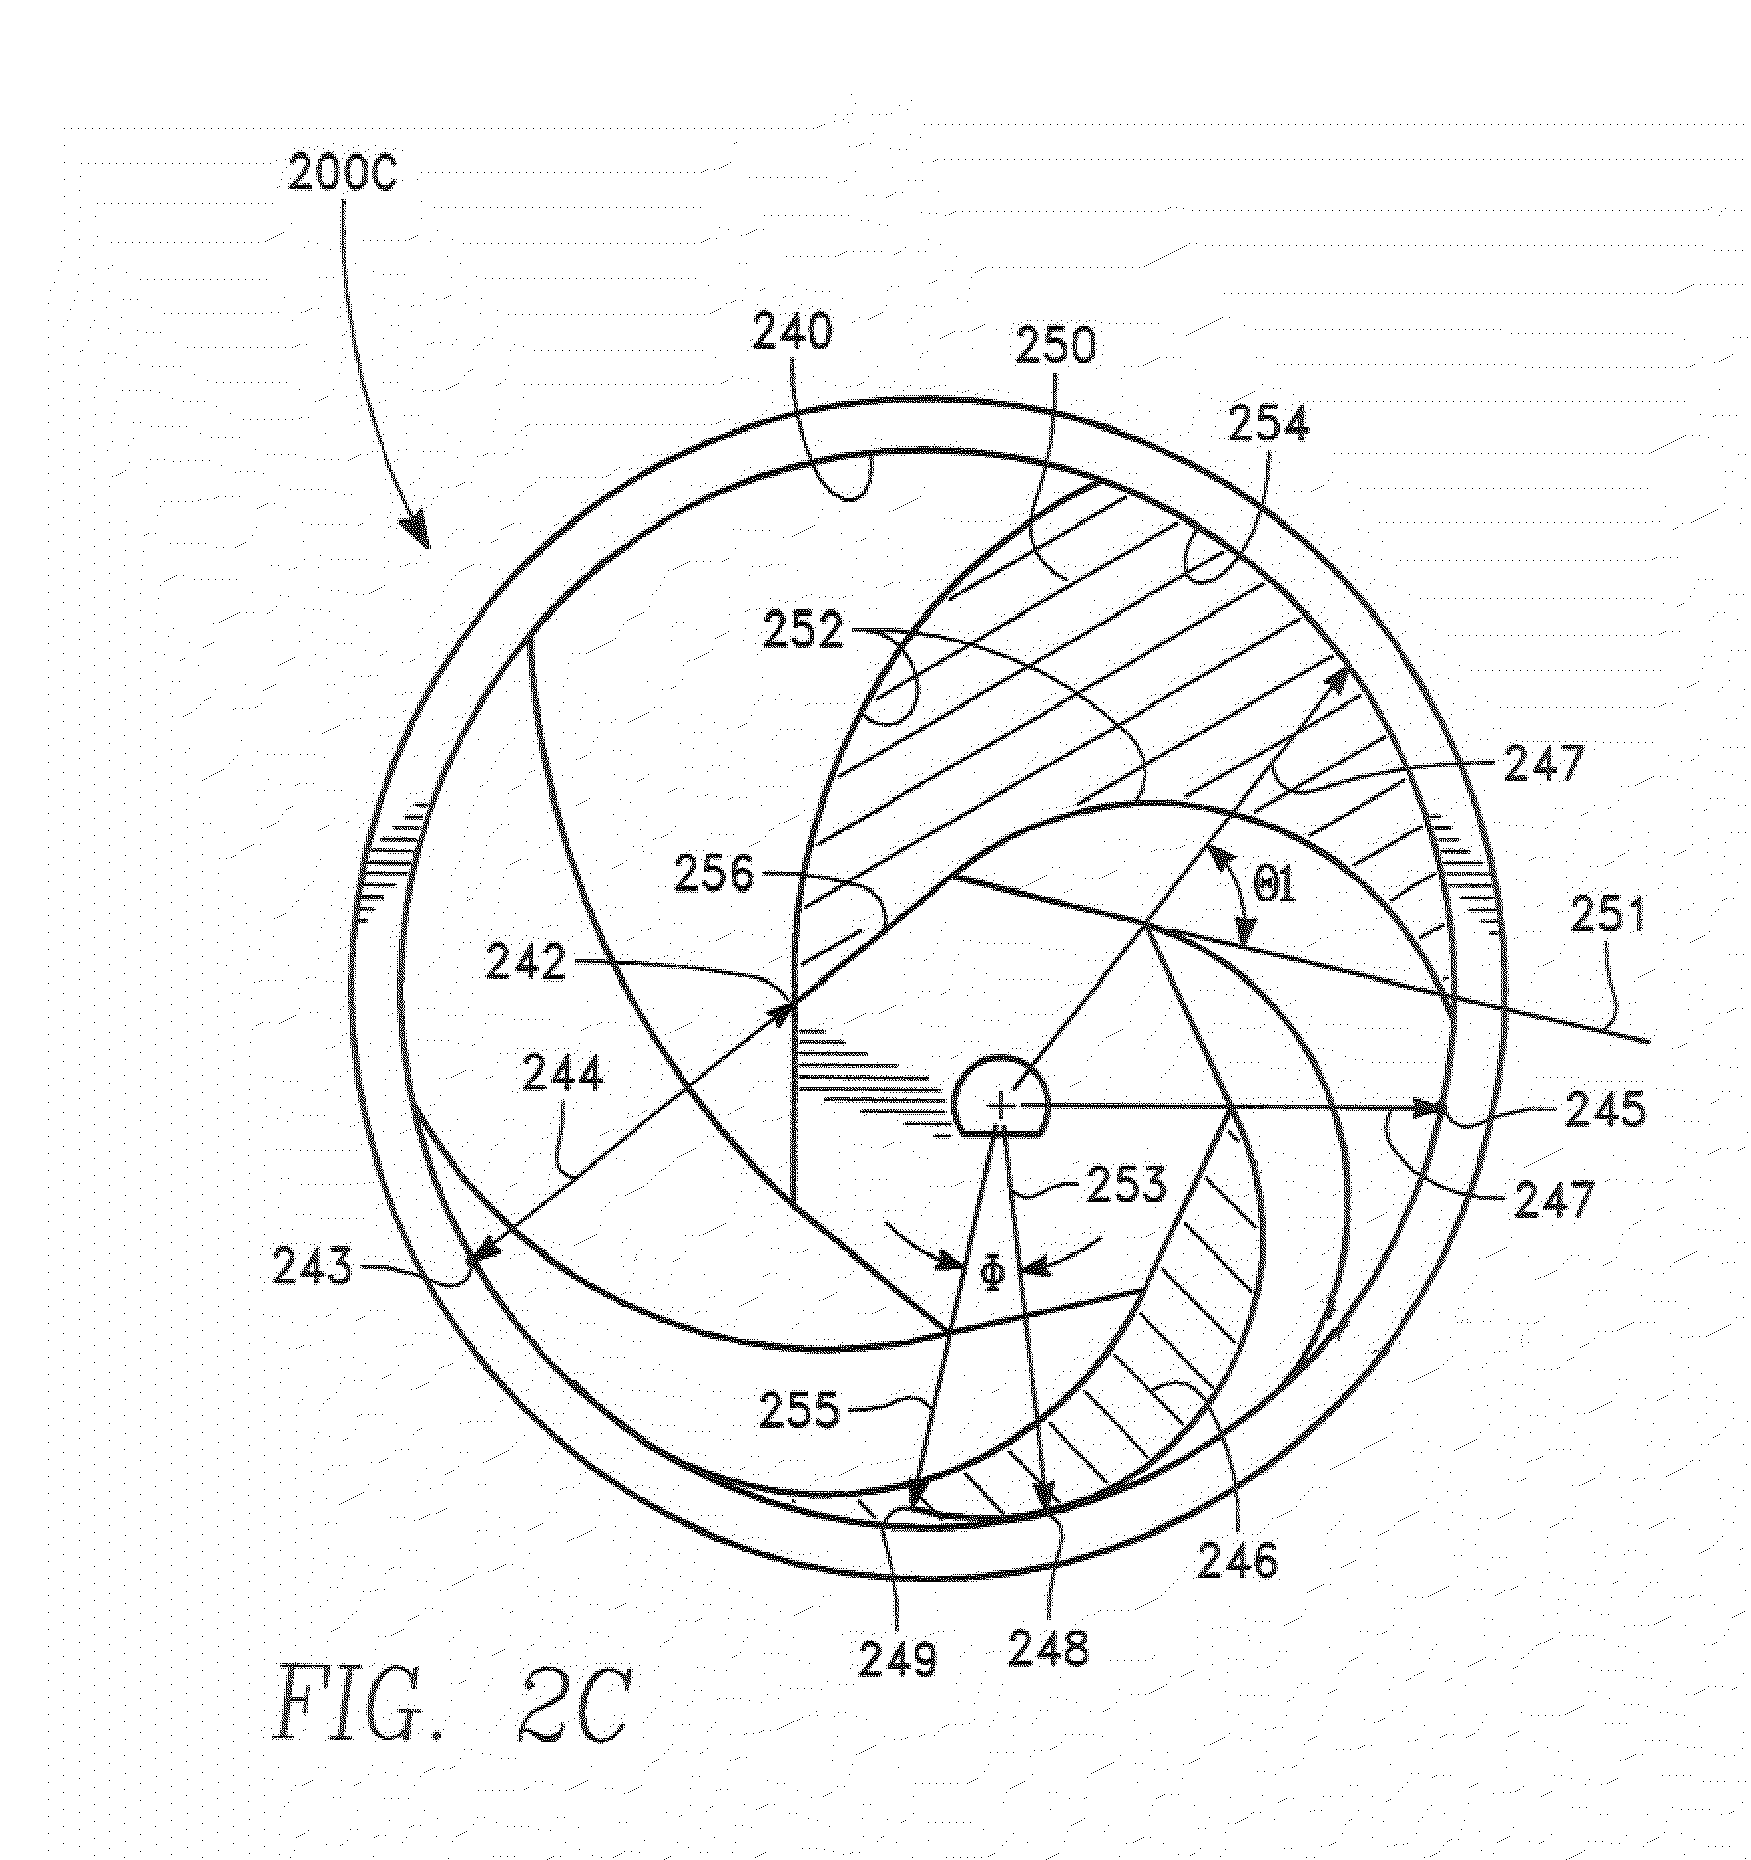 trail king wiring diagram remote wiring diagram database Six Wire Trailer Wiring Diagram patent us 7 775 062 b2 fontaine wiring diagram patent